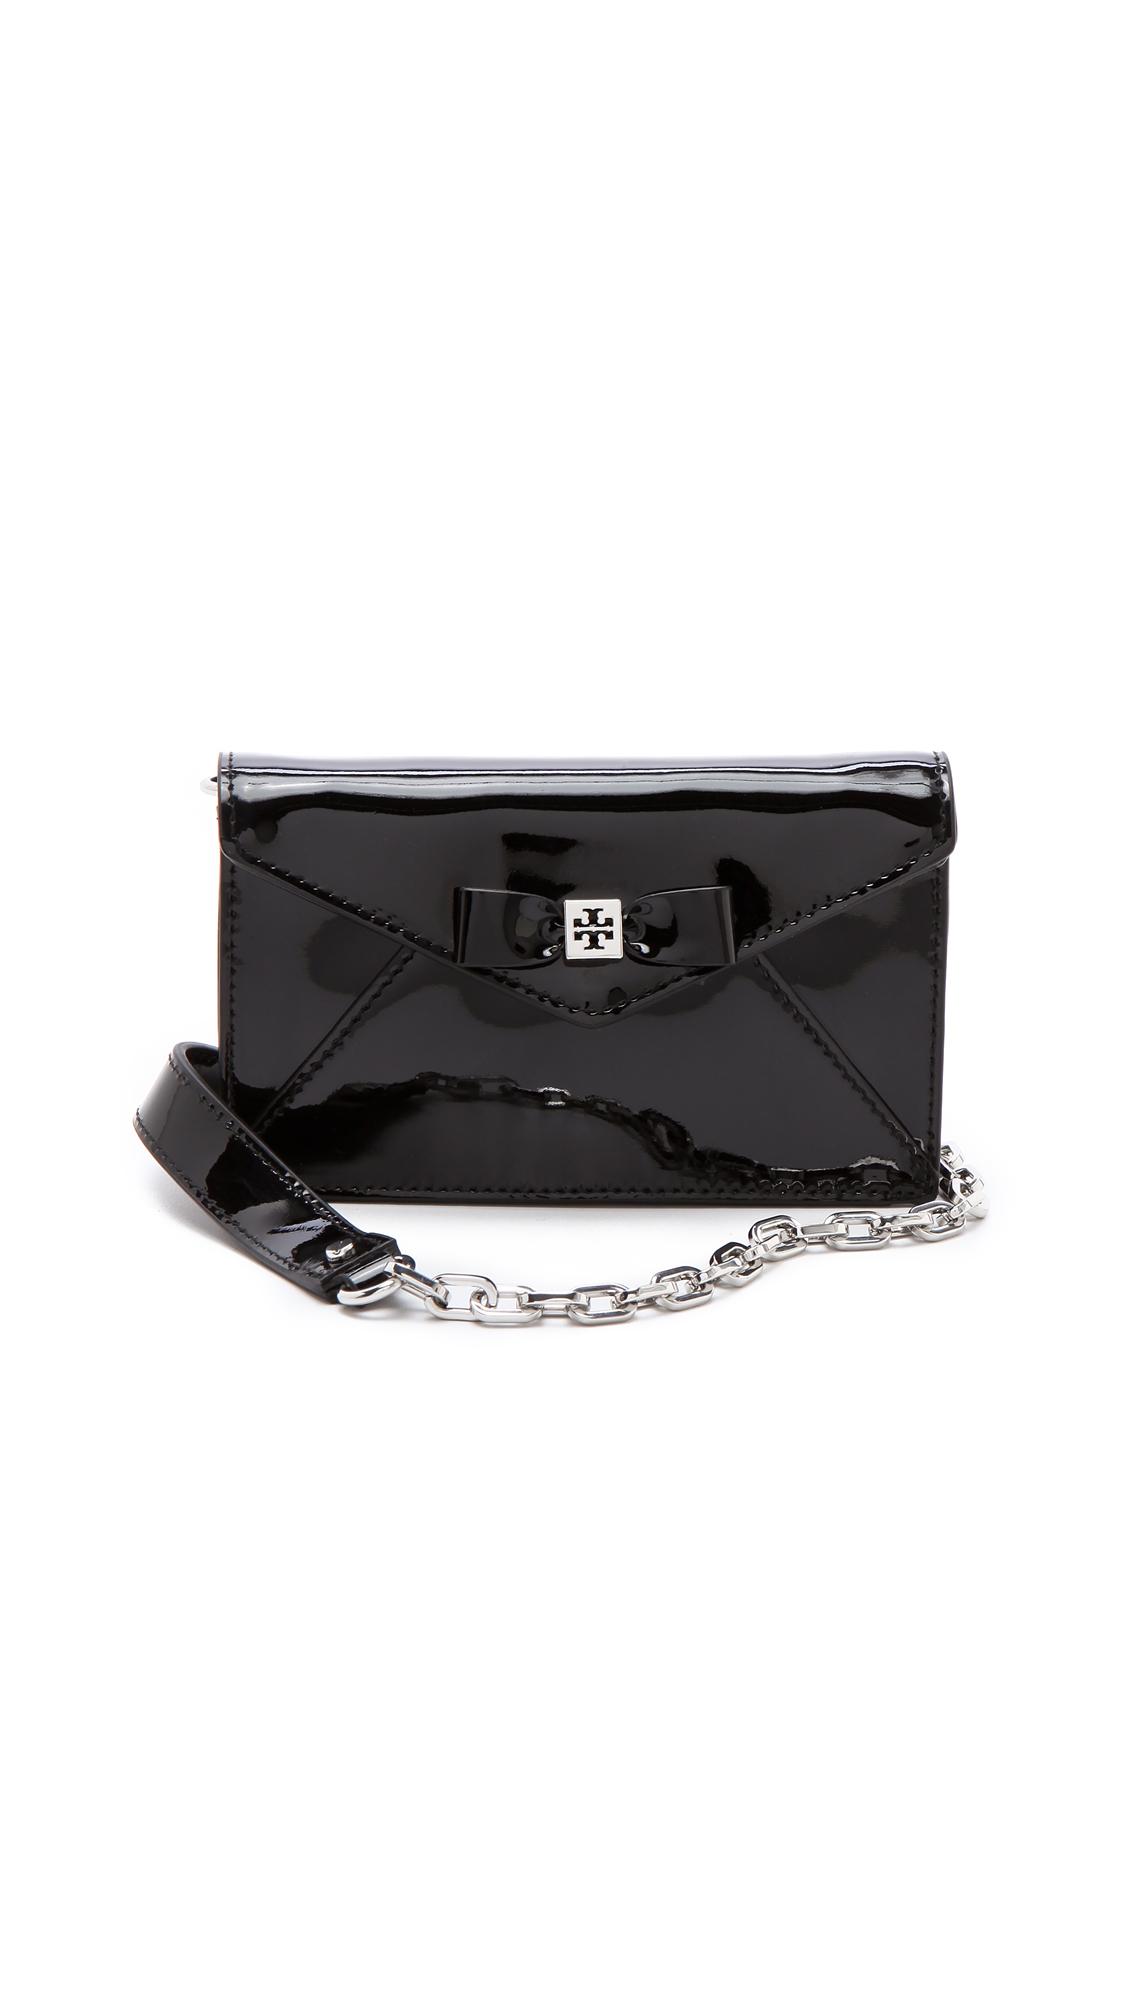 40d3eec01fb Tory Burch Bow Envelope Cross Body Bag